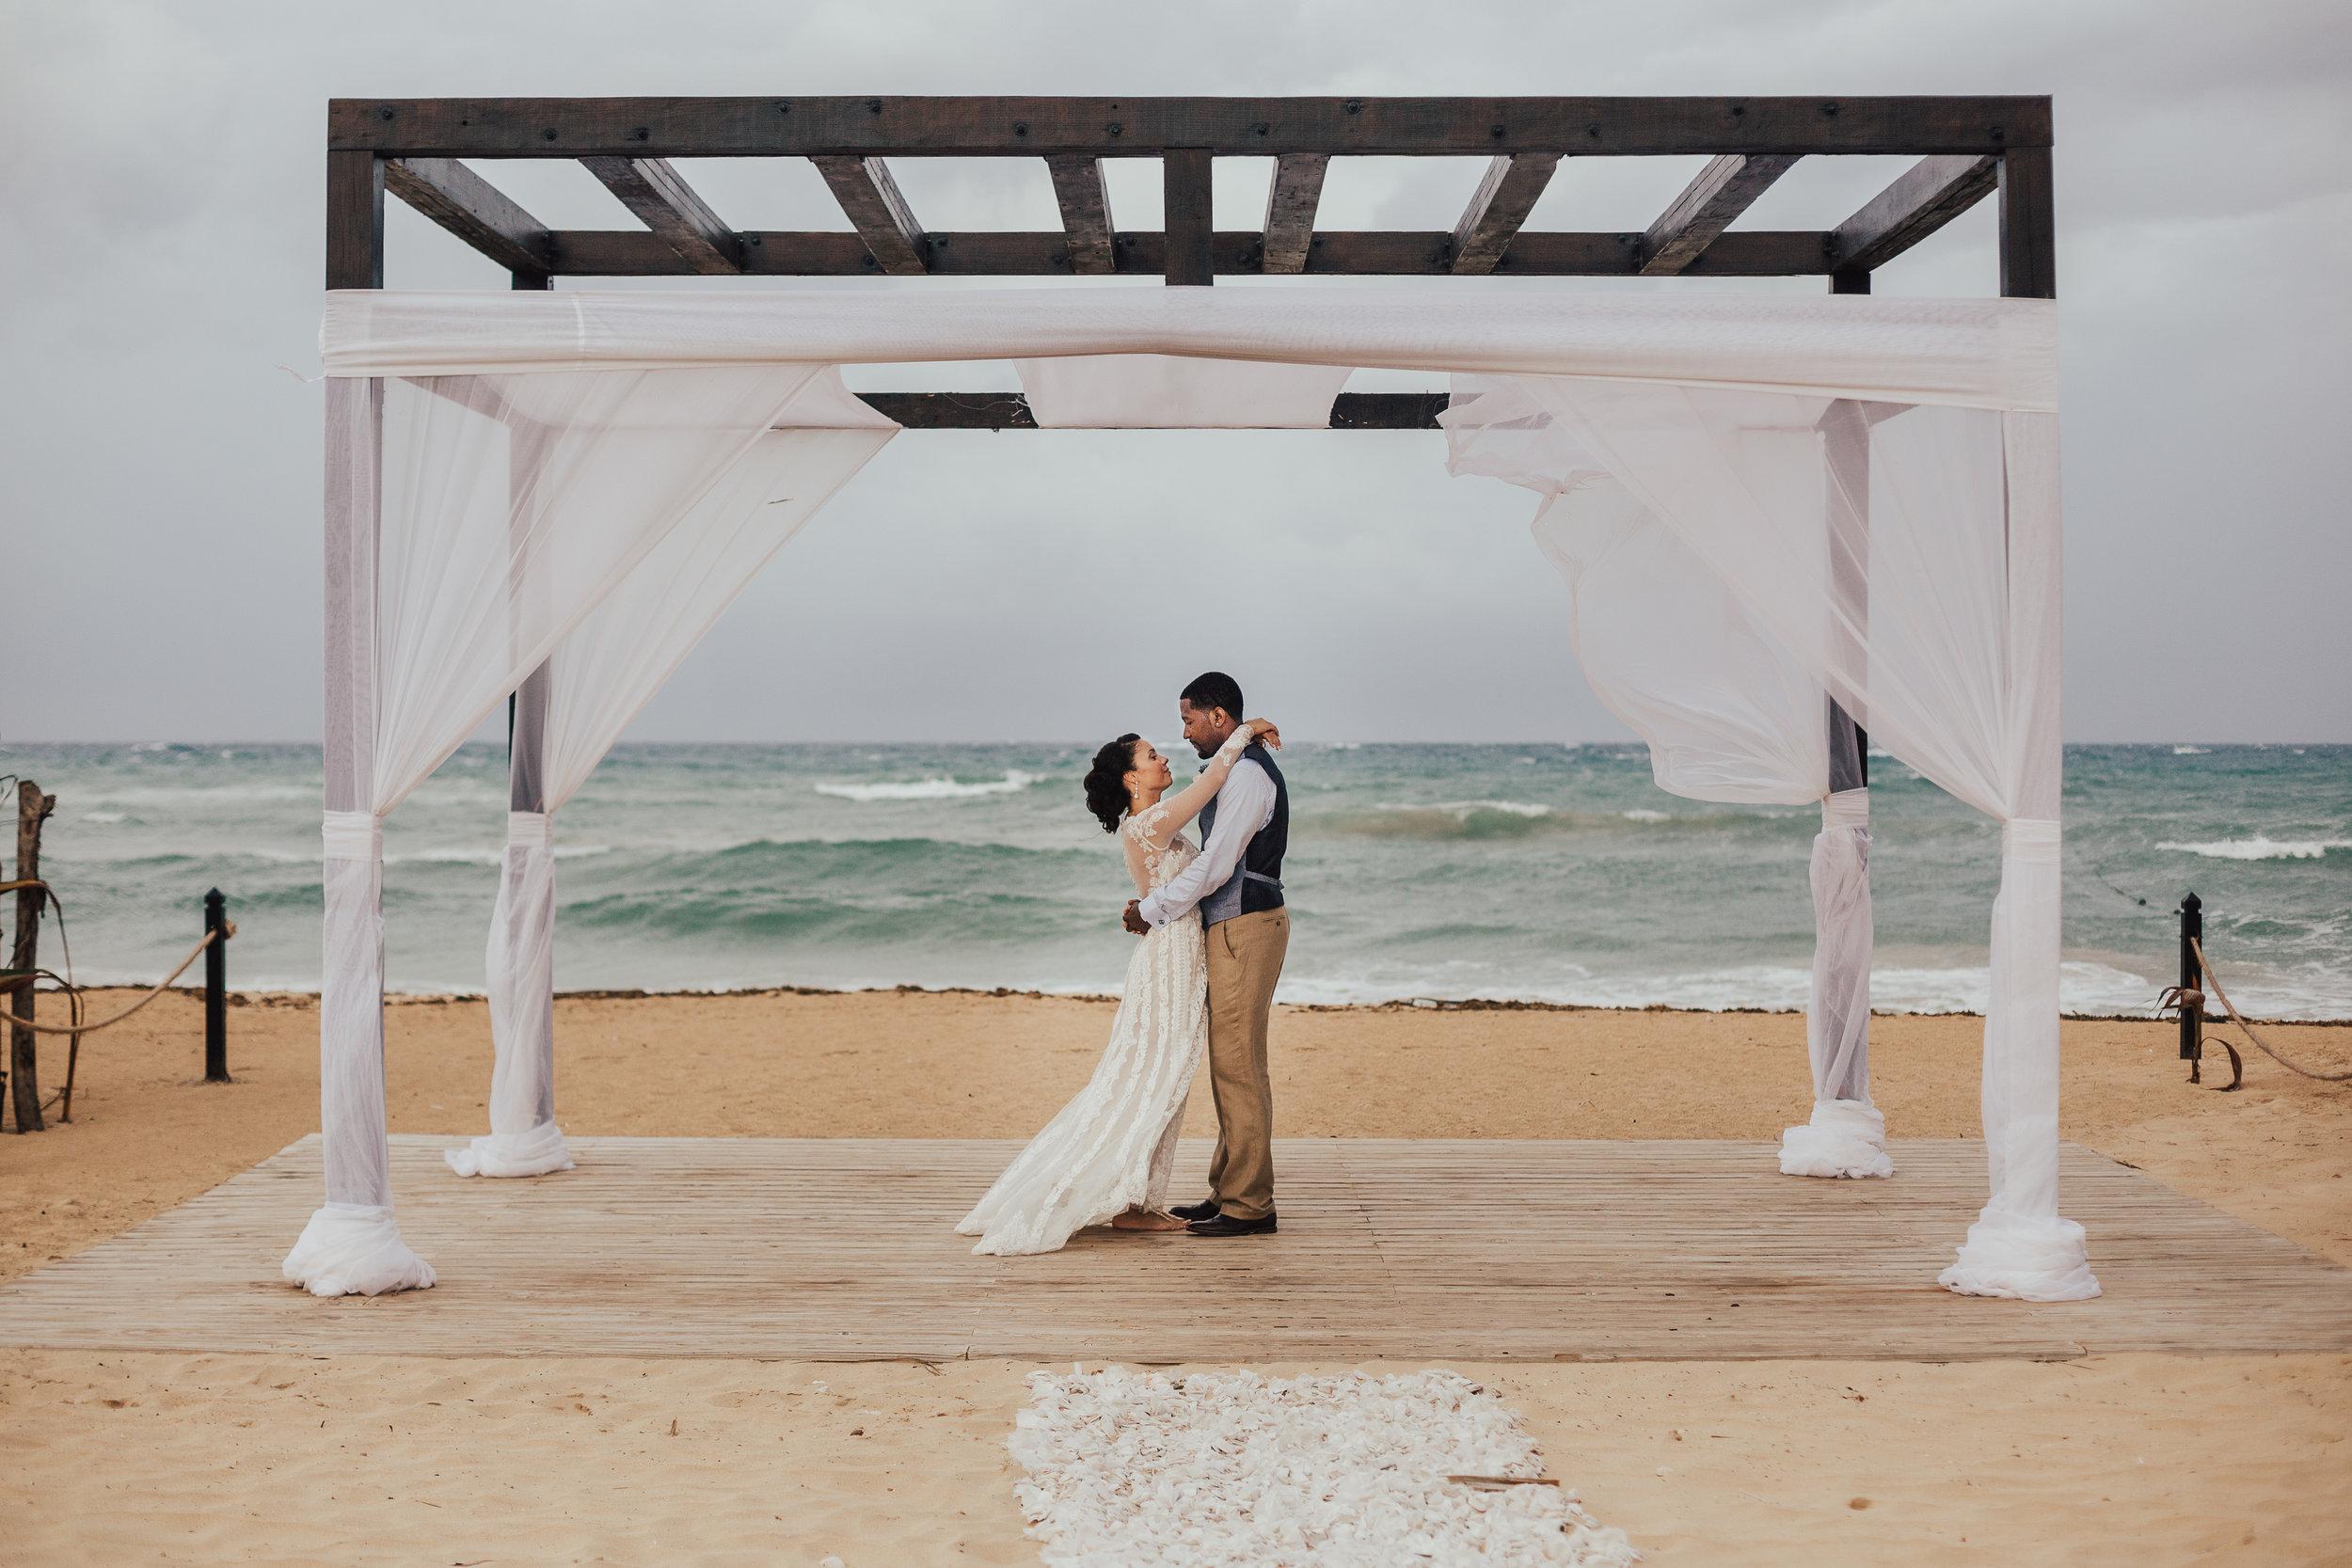 Destination-Wedding-Photographer-cleveland-wedding-photographer-elopement-photographer-elope-beach-wedding